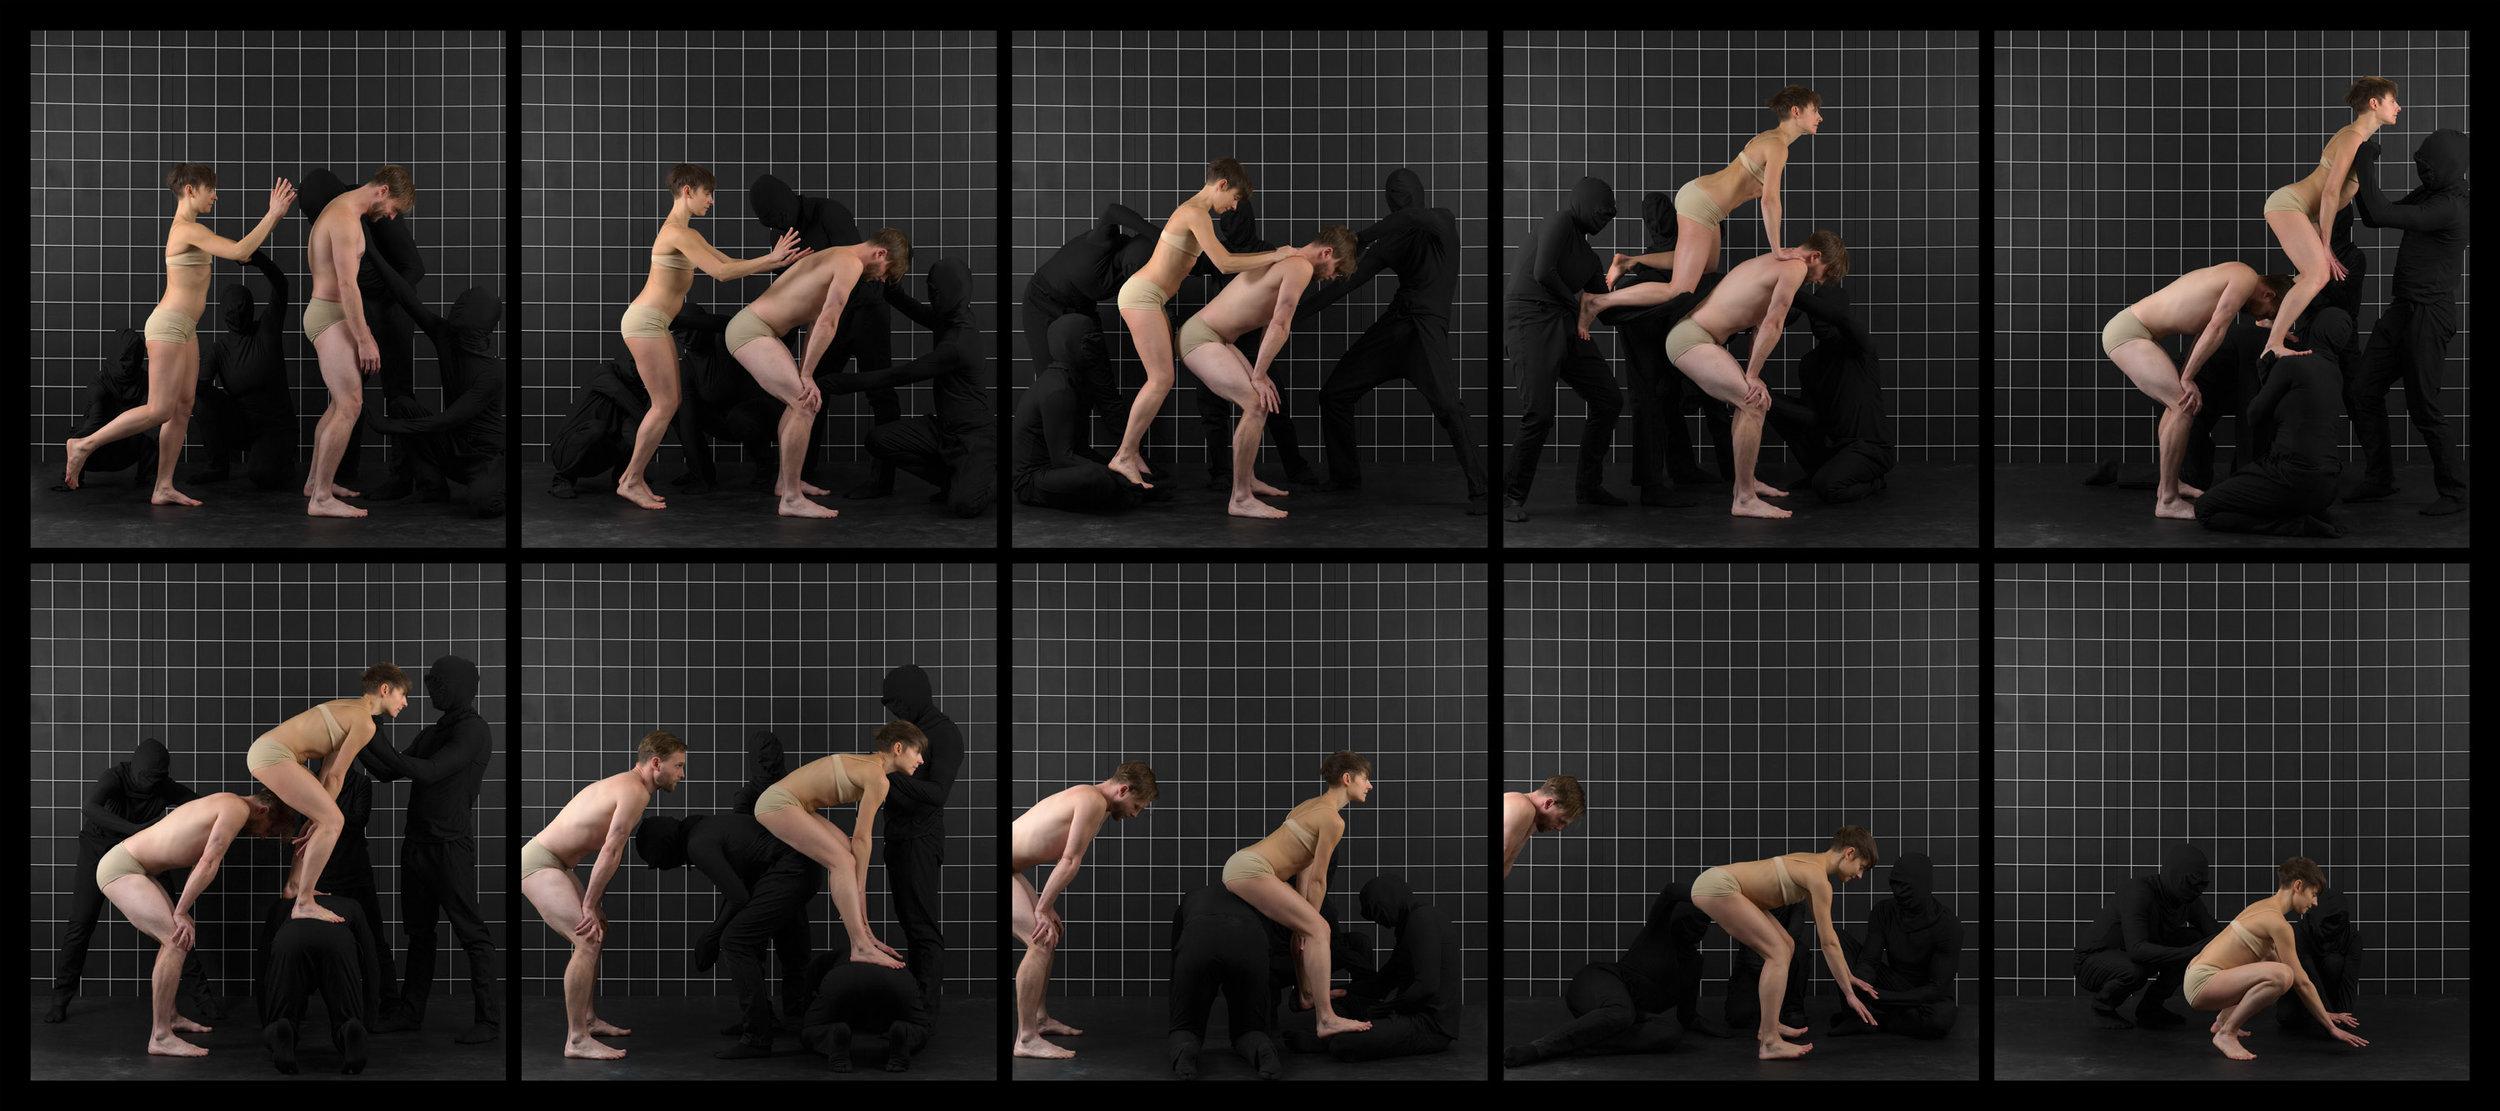 "After Muybridge (Leap Frog)  2016, archival pigment print 46.5 x 104 cm (18.25"" x 41"")  93 x 208.5 cm (36.5"" x 82"") Editions of 2"